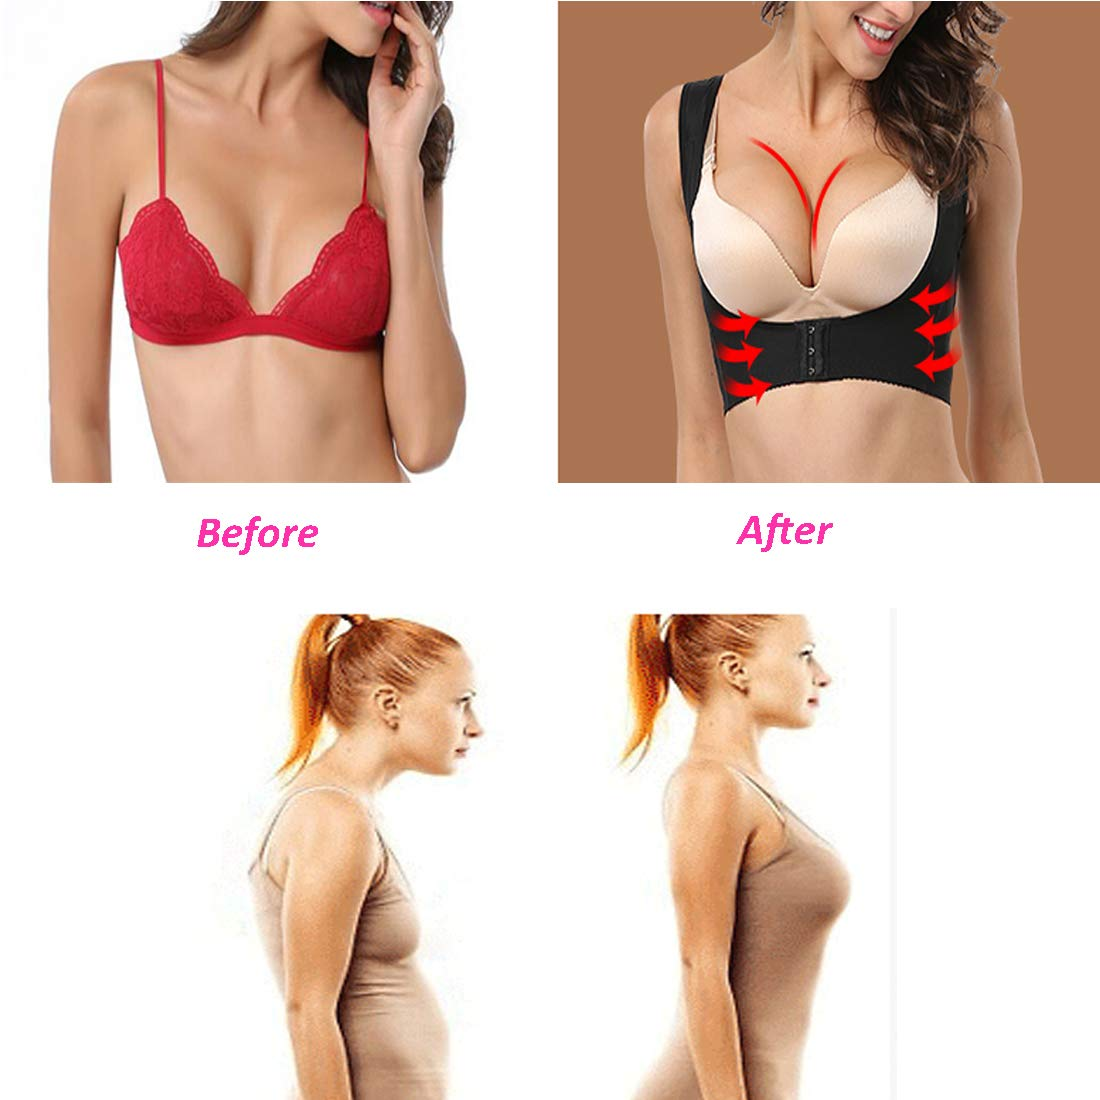 02262da046 Posture Corrector Shapewear for Women Compression Bra Chest Brace Up  Support Tops Vest Shaper Joyshaper